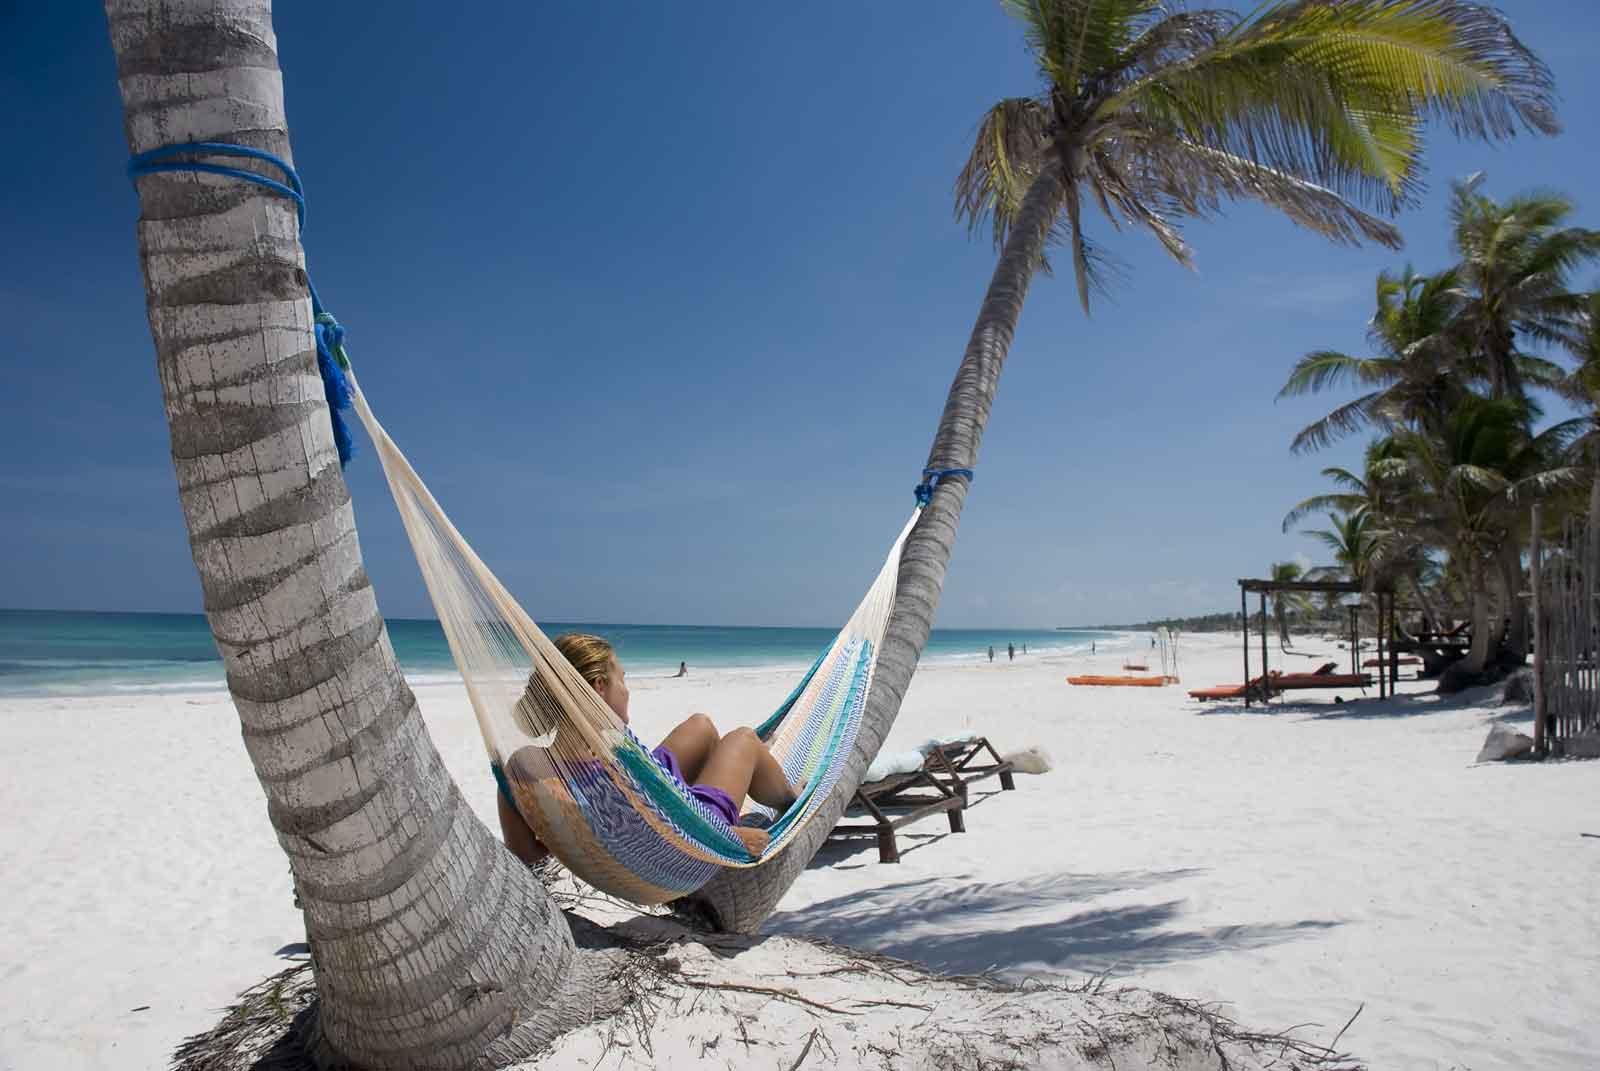 World 180 S Top 25 Beaches By Tripadvisor Thinkingoftravel Com